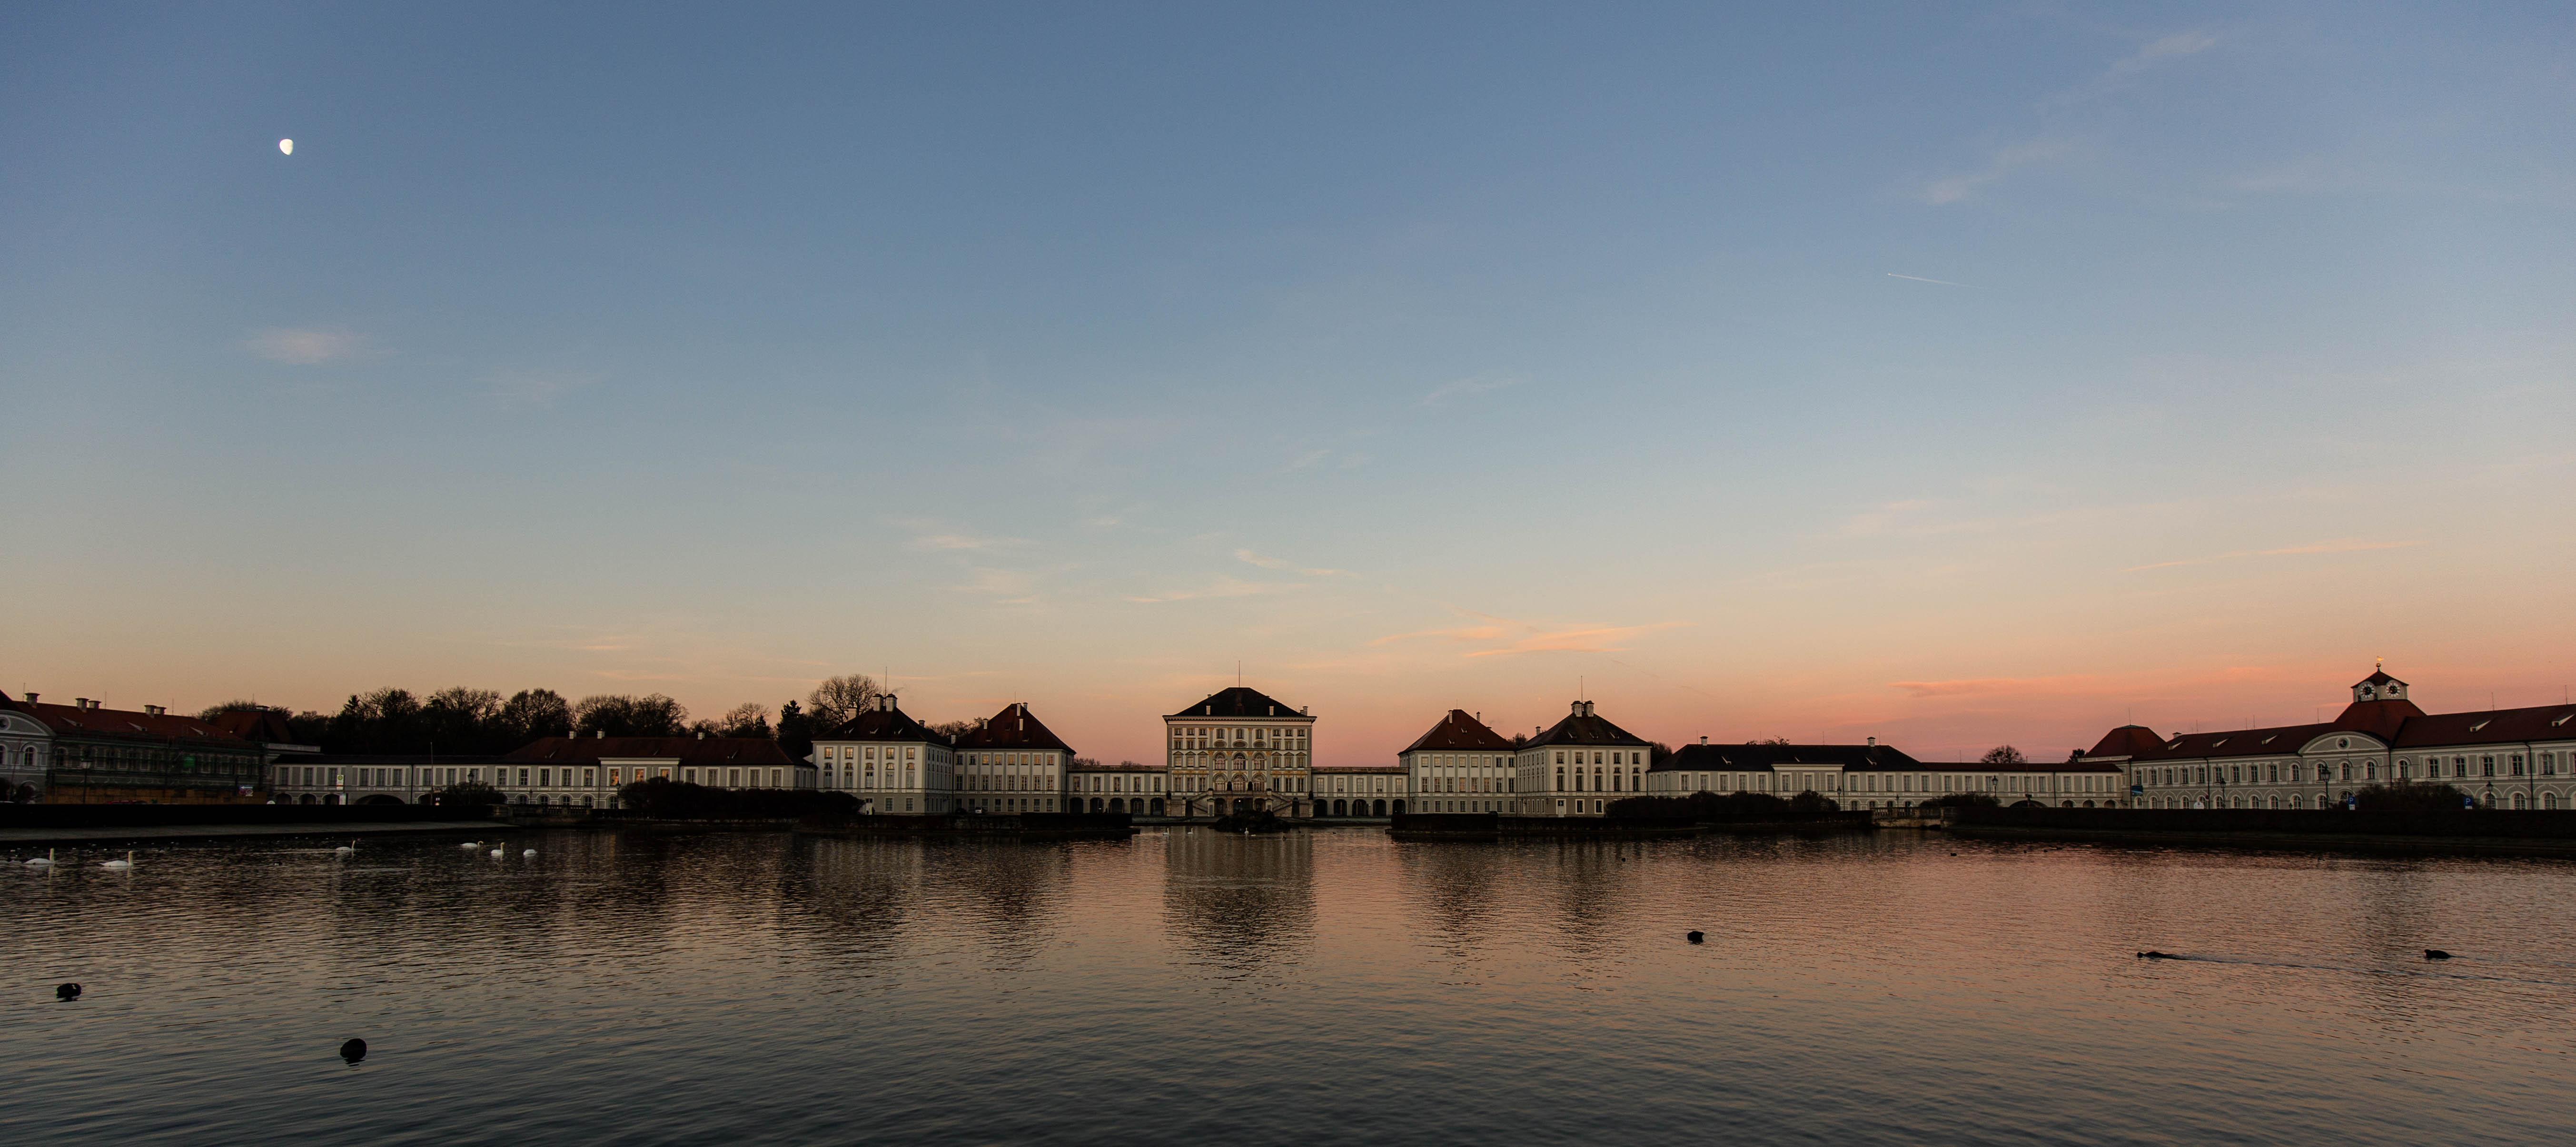 Schlossansicht am frühen Morgen